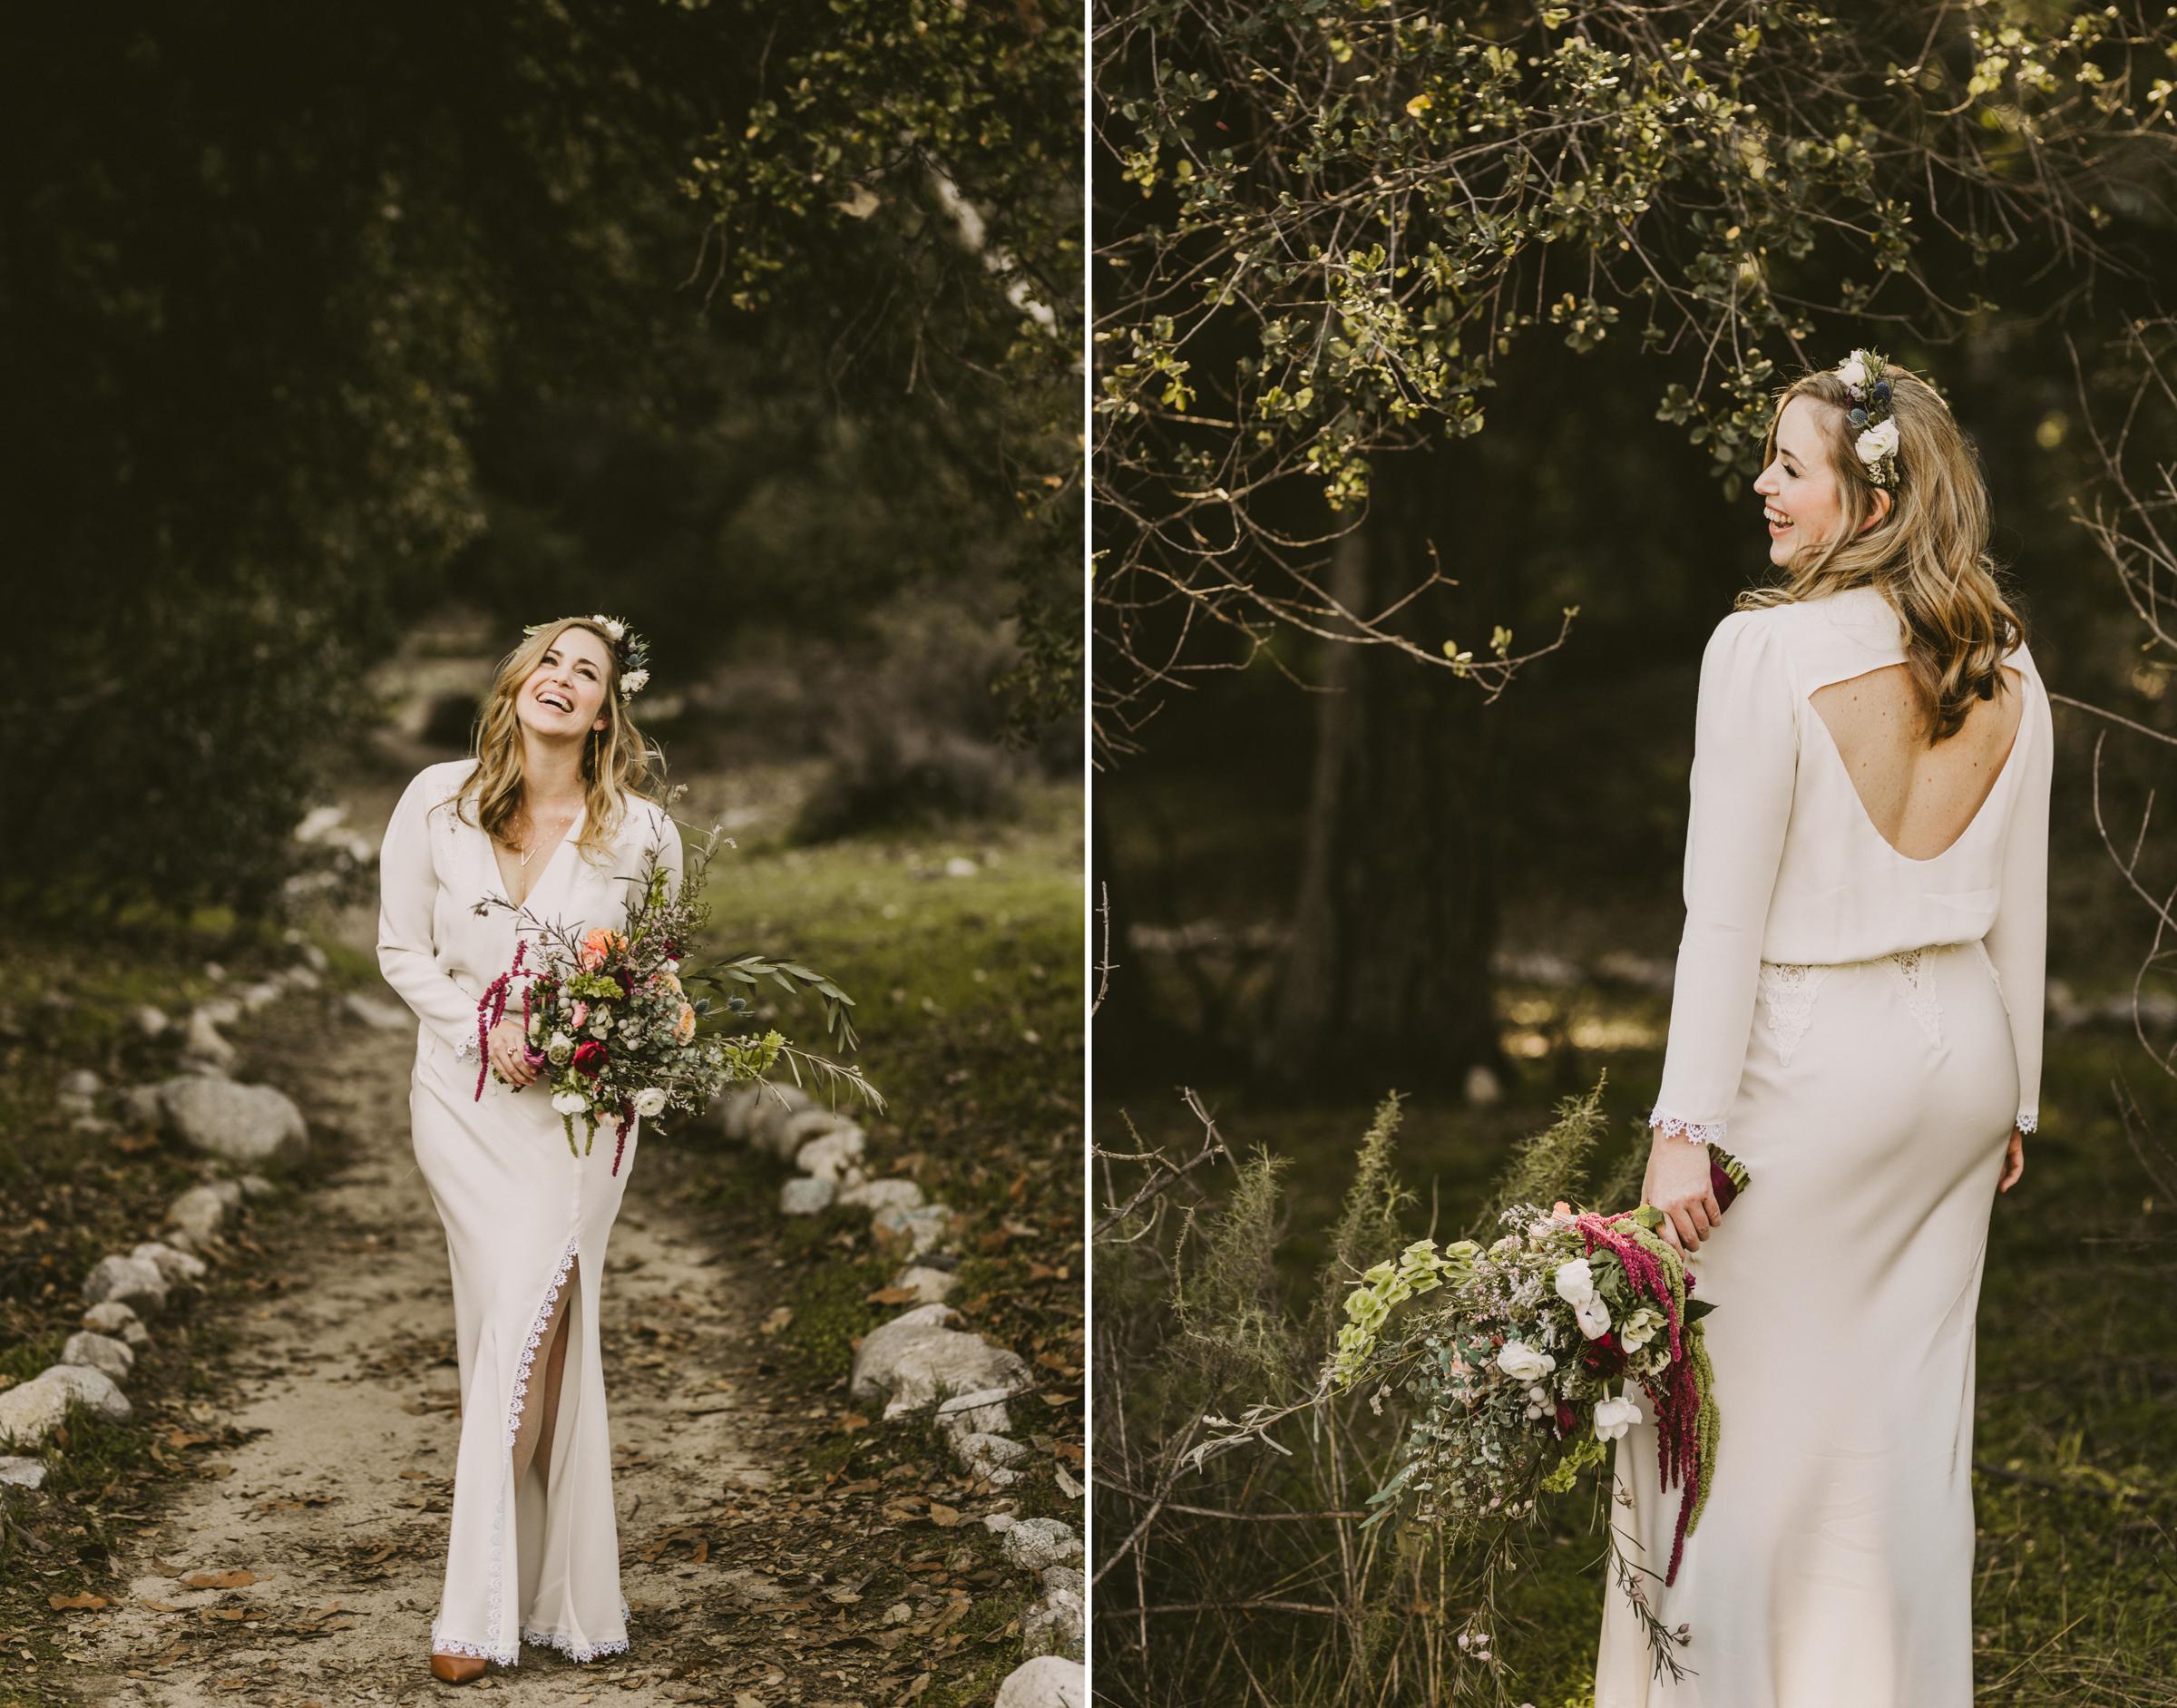 ©Isaiah + Taylor Photography - Intimate Elopement, Eaton Canyon, Los Angeles Wedding Photographer-4.jpg